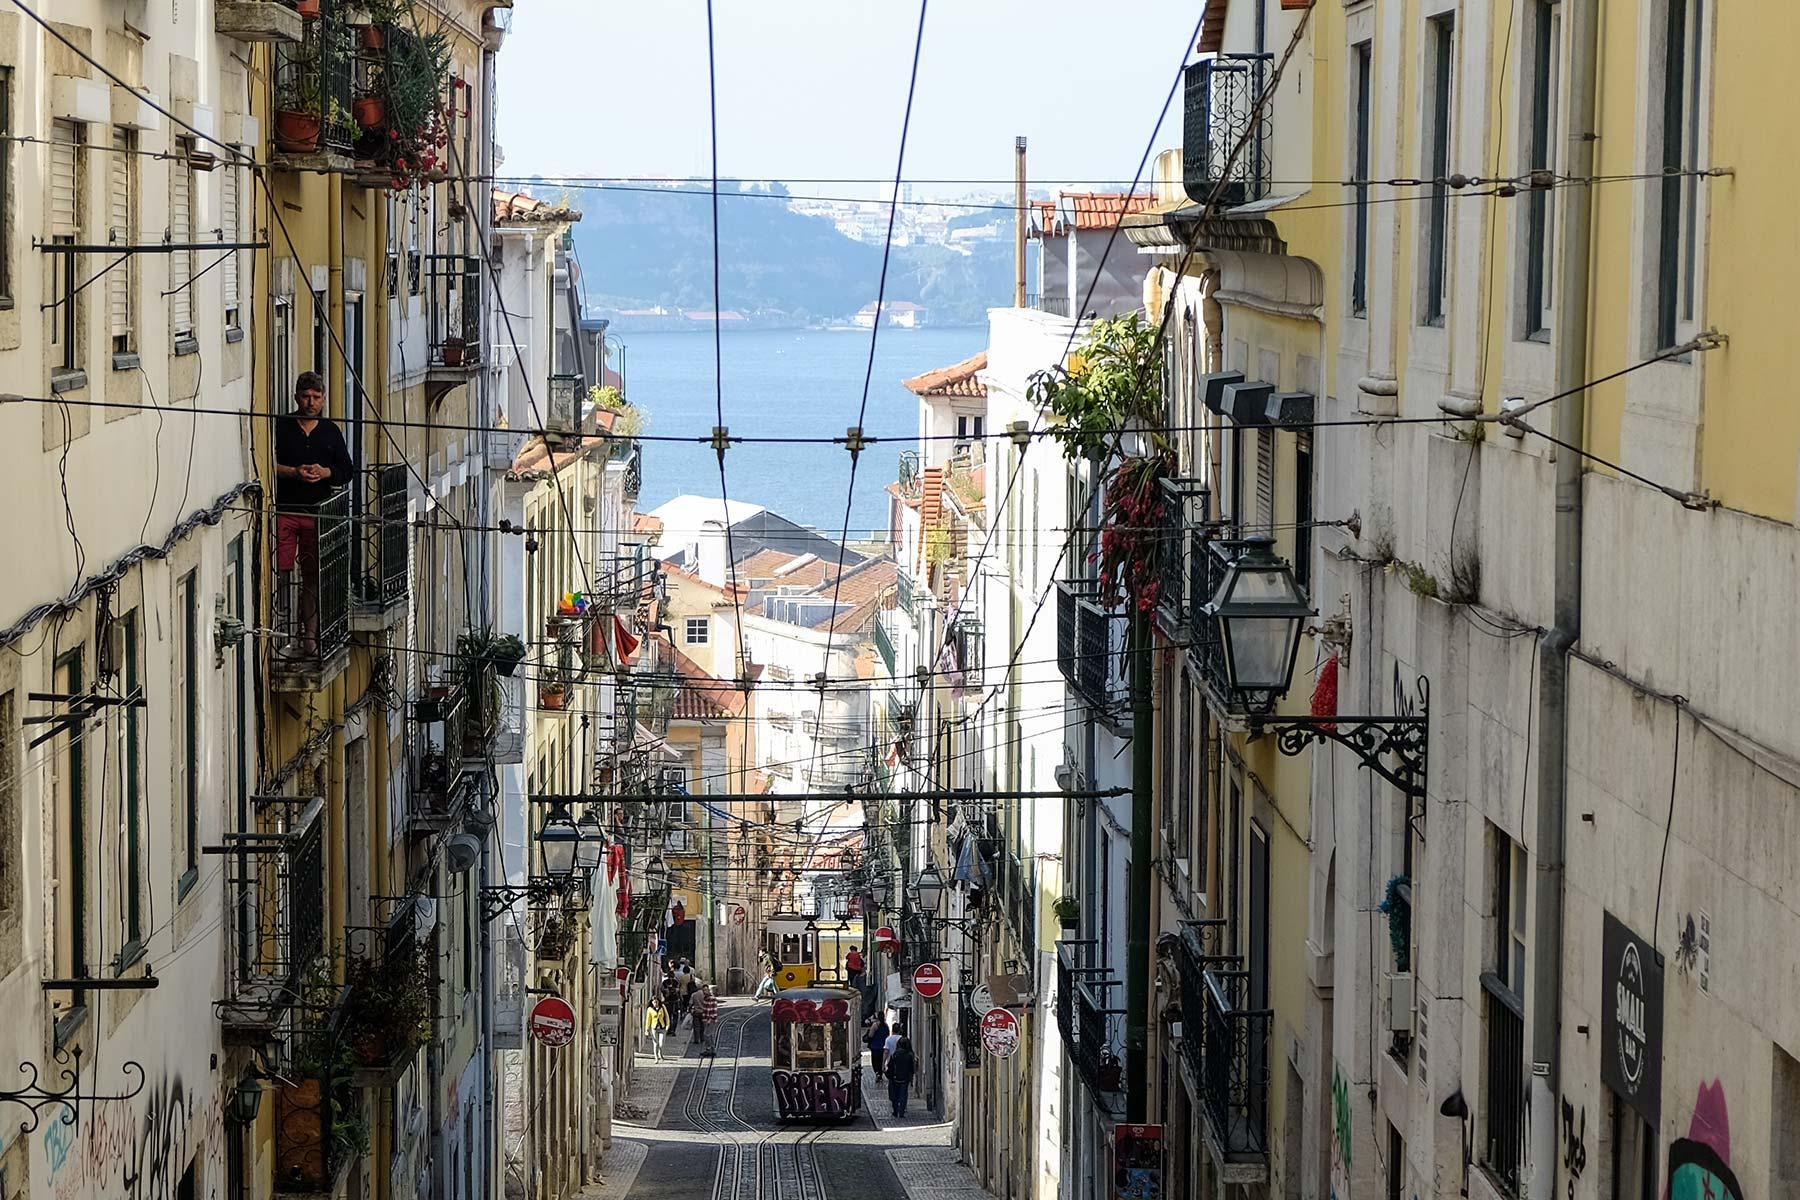 Standseilbahn Bica am Largo do Calhariz in Lissabon, Portugal